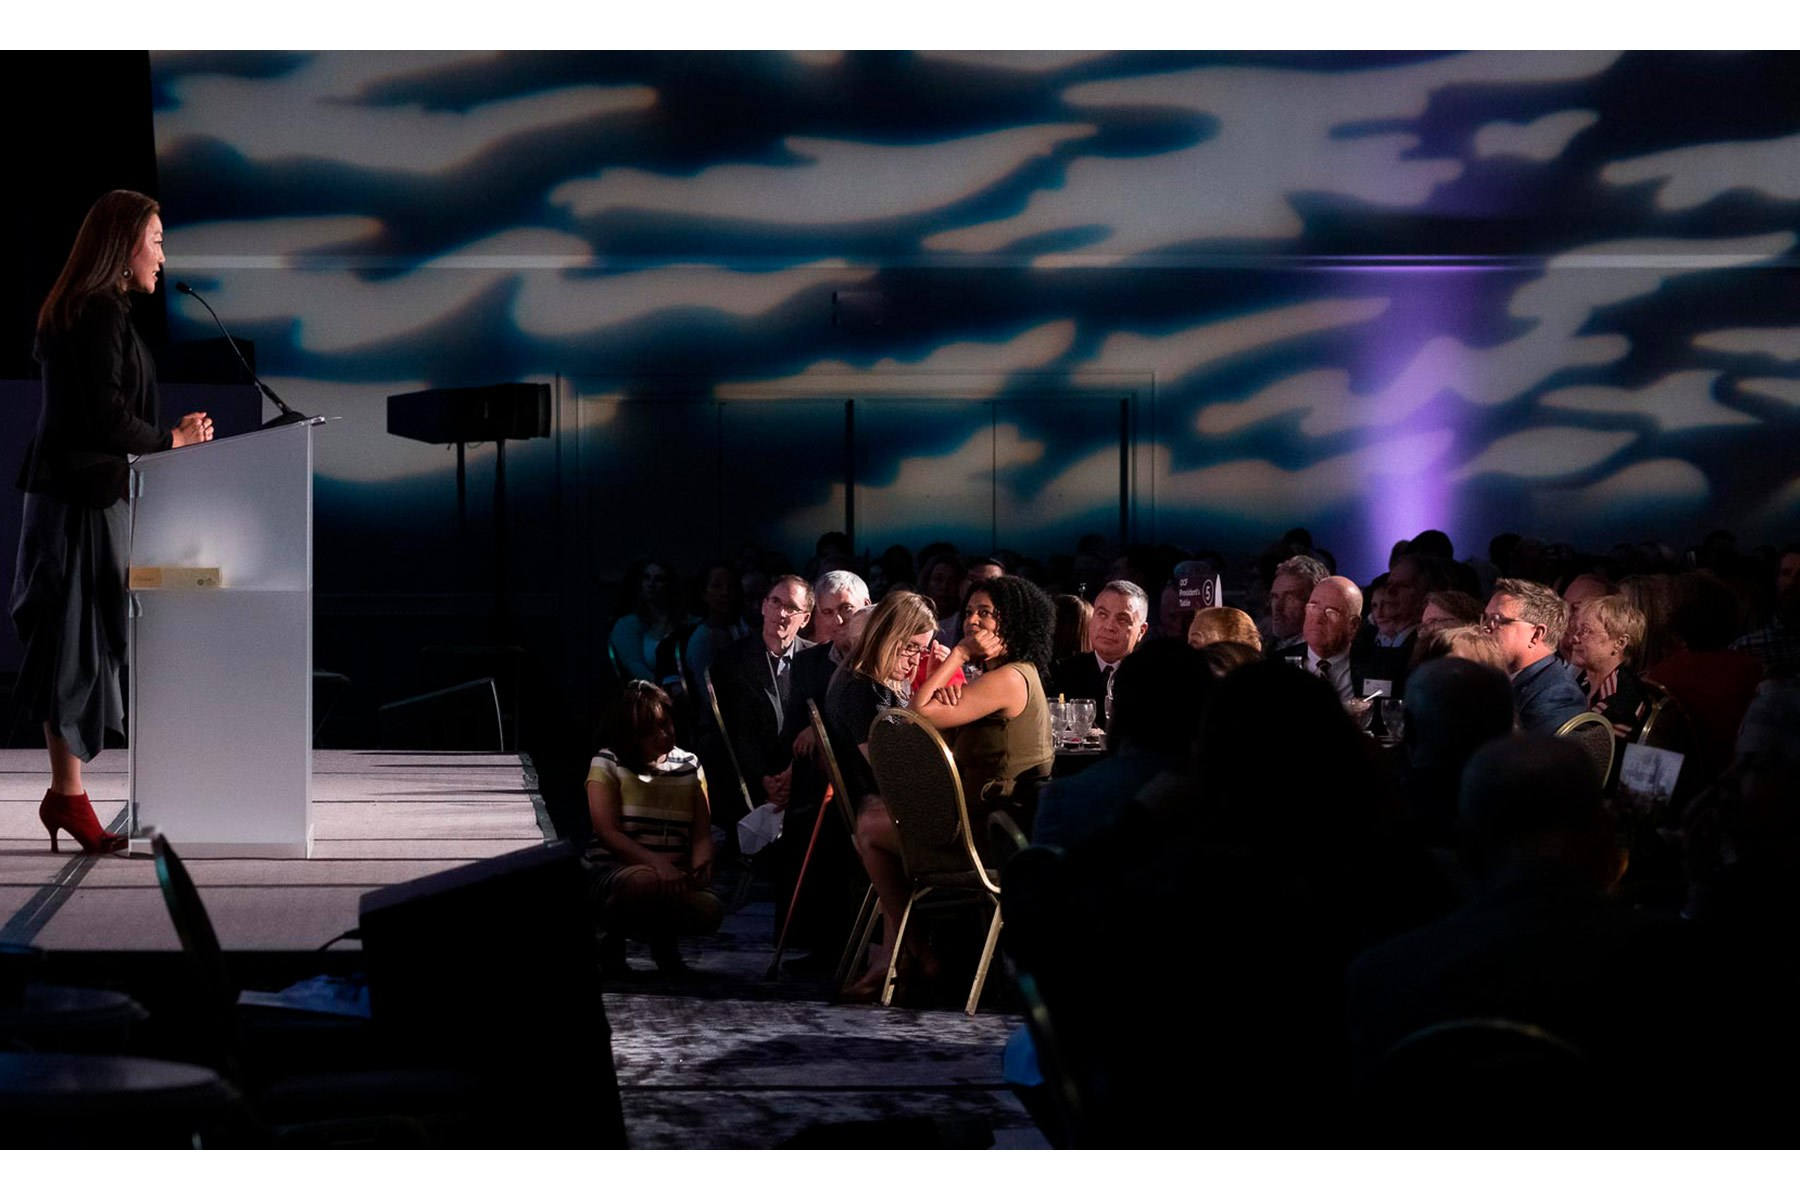 event-photography-portland-oregon-community-foundation-02